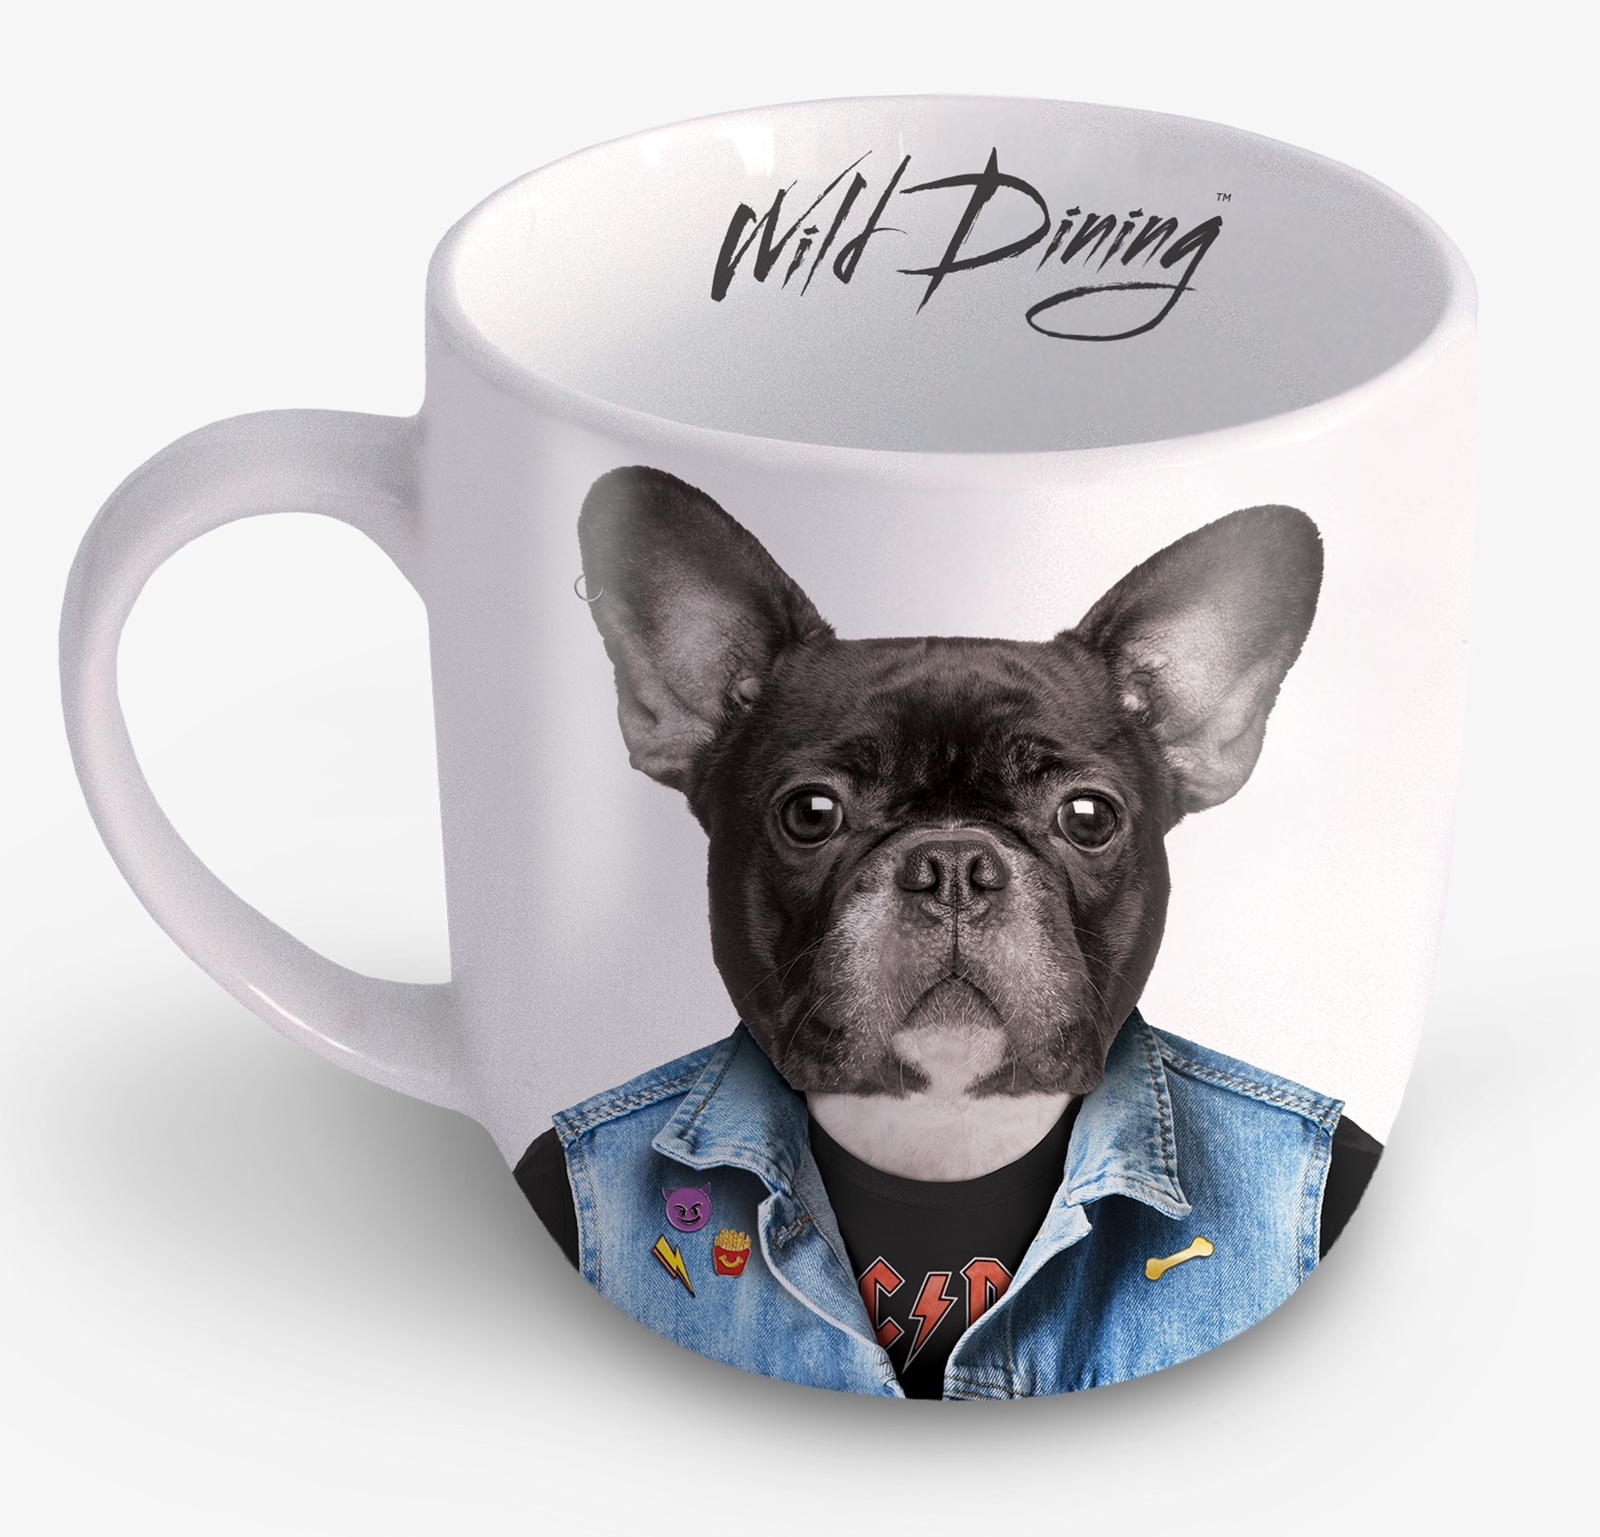 Wild Dining: Ceramic Mug - Dog image